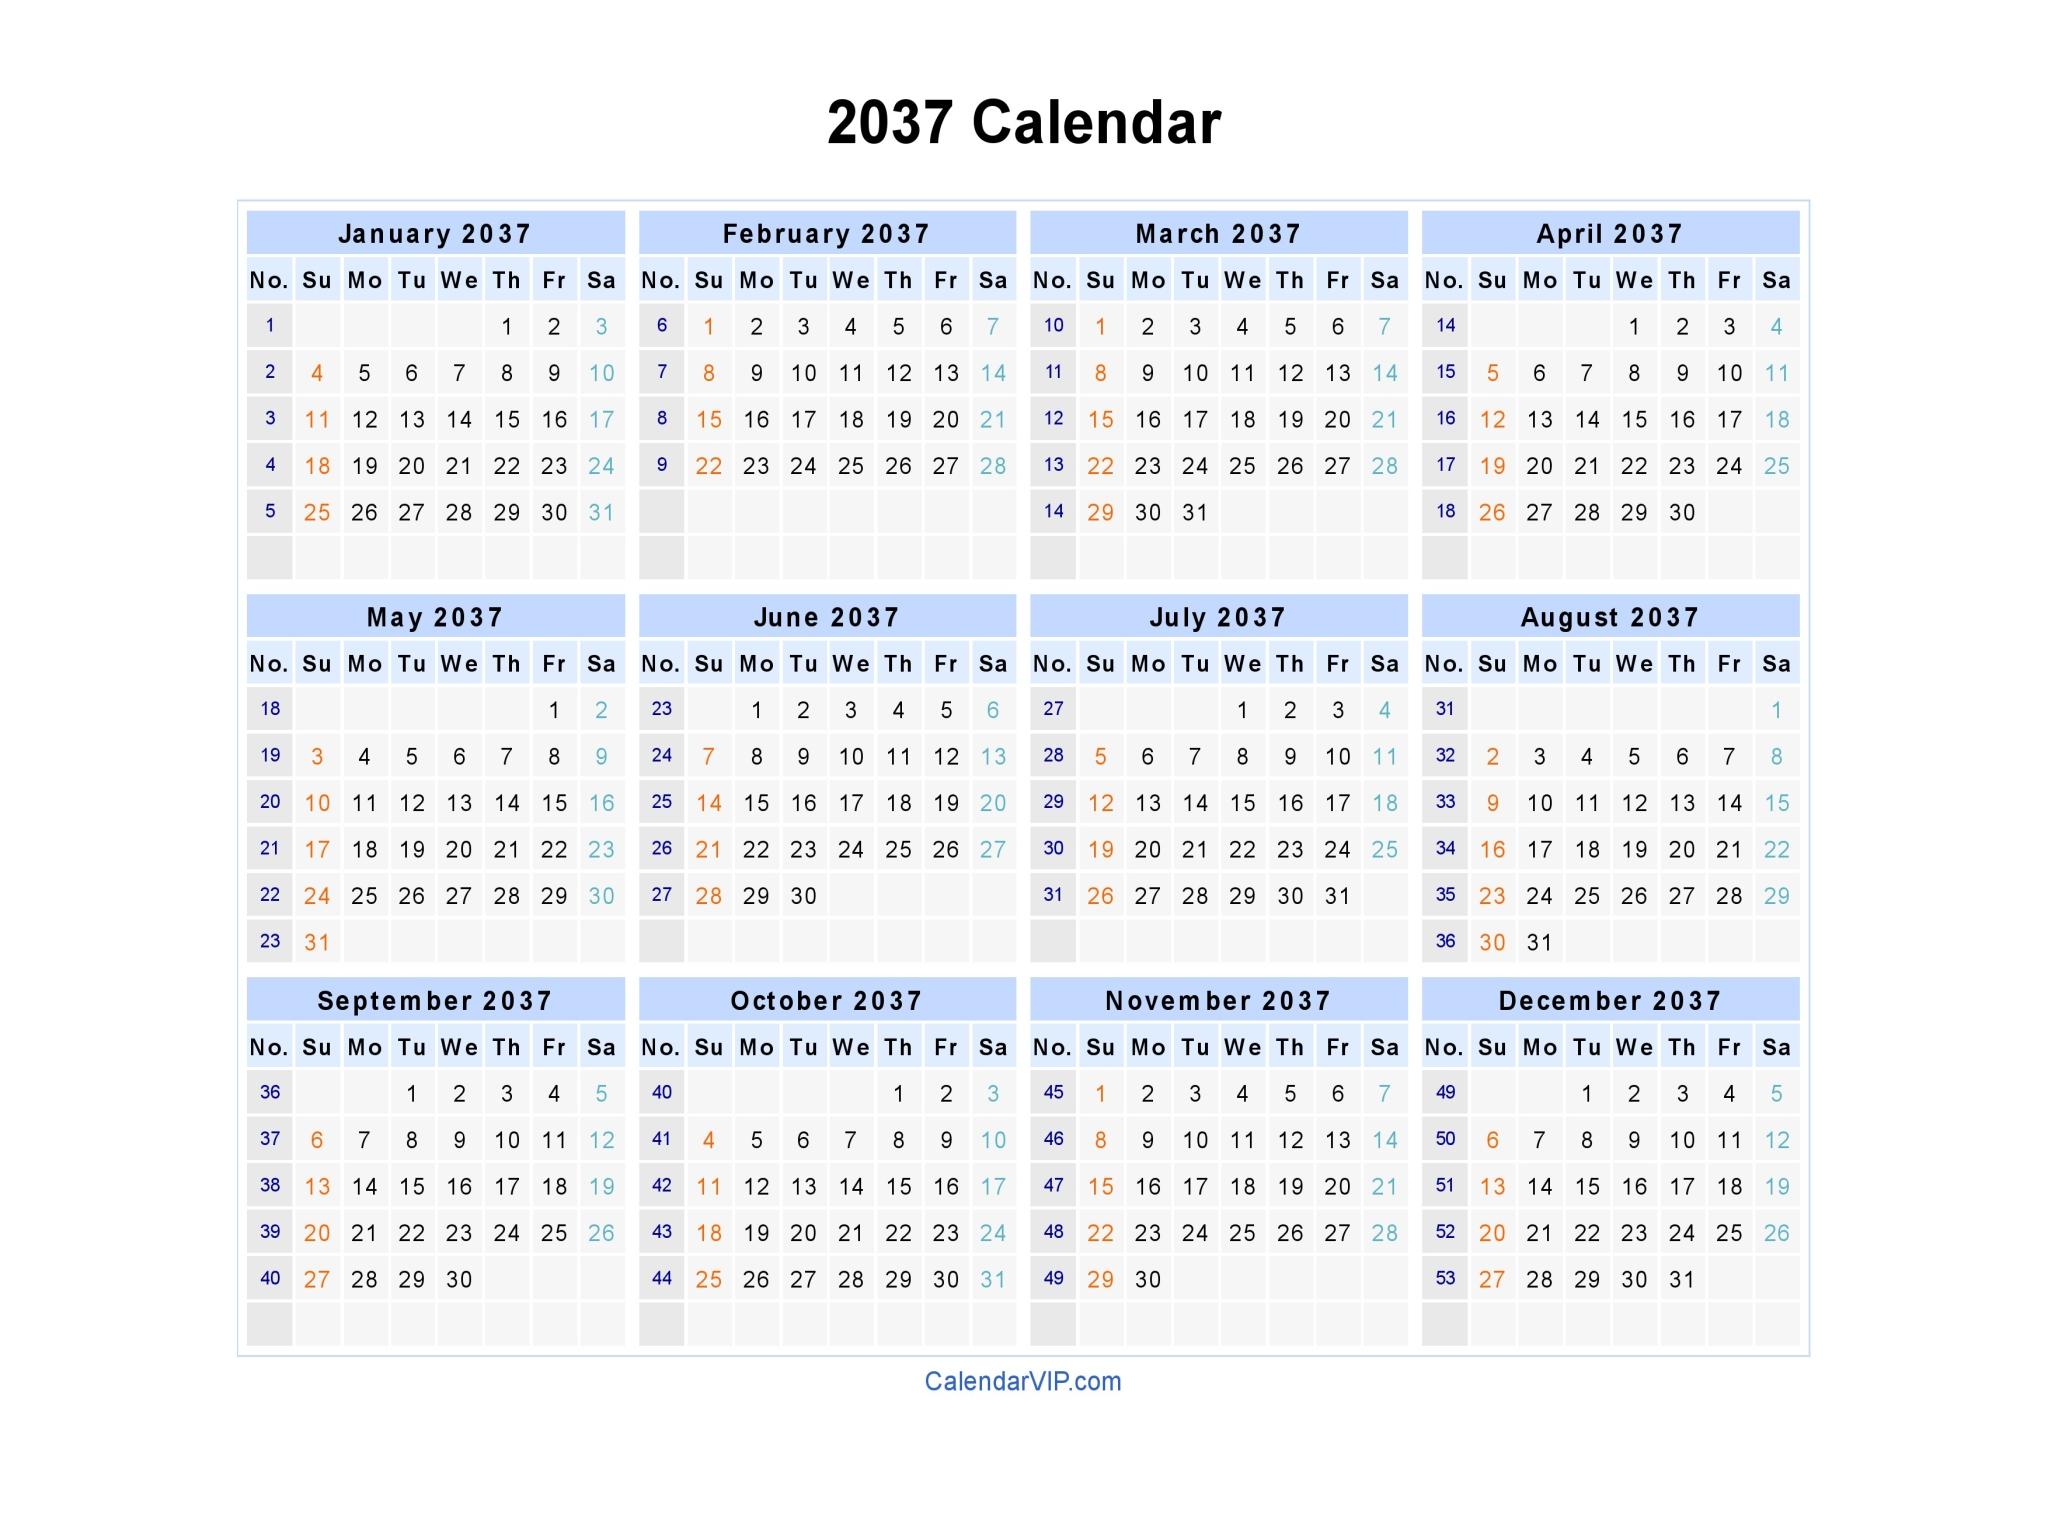 Calendar 2014 Template For Word Calendar Templates 2014 2037 Calendar Blank Printable Calendar Template In Pdf